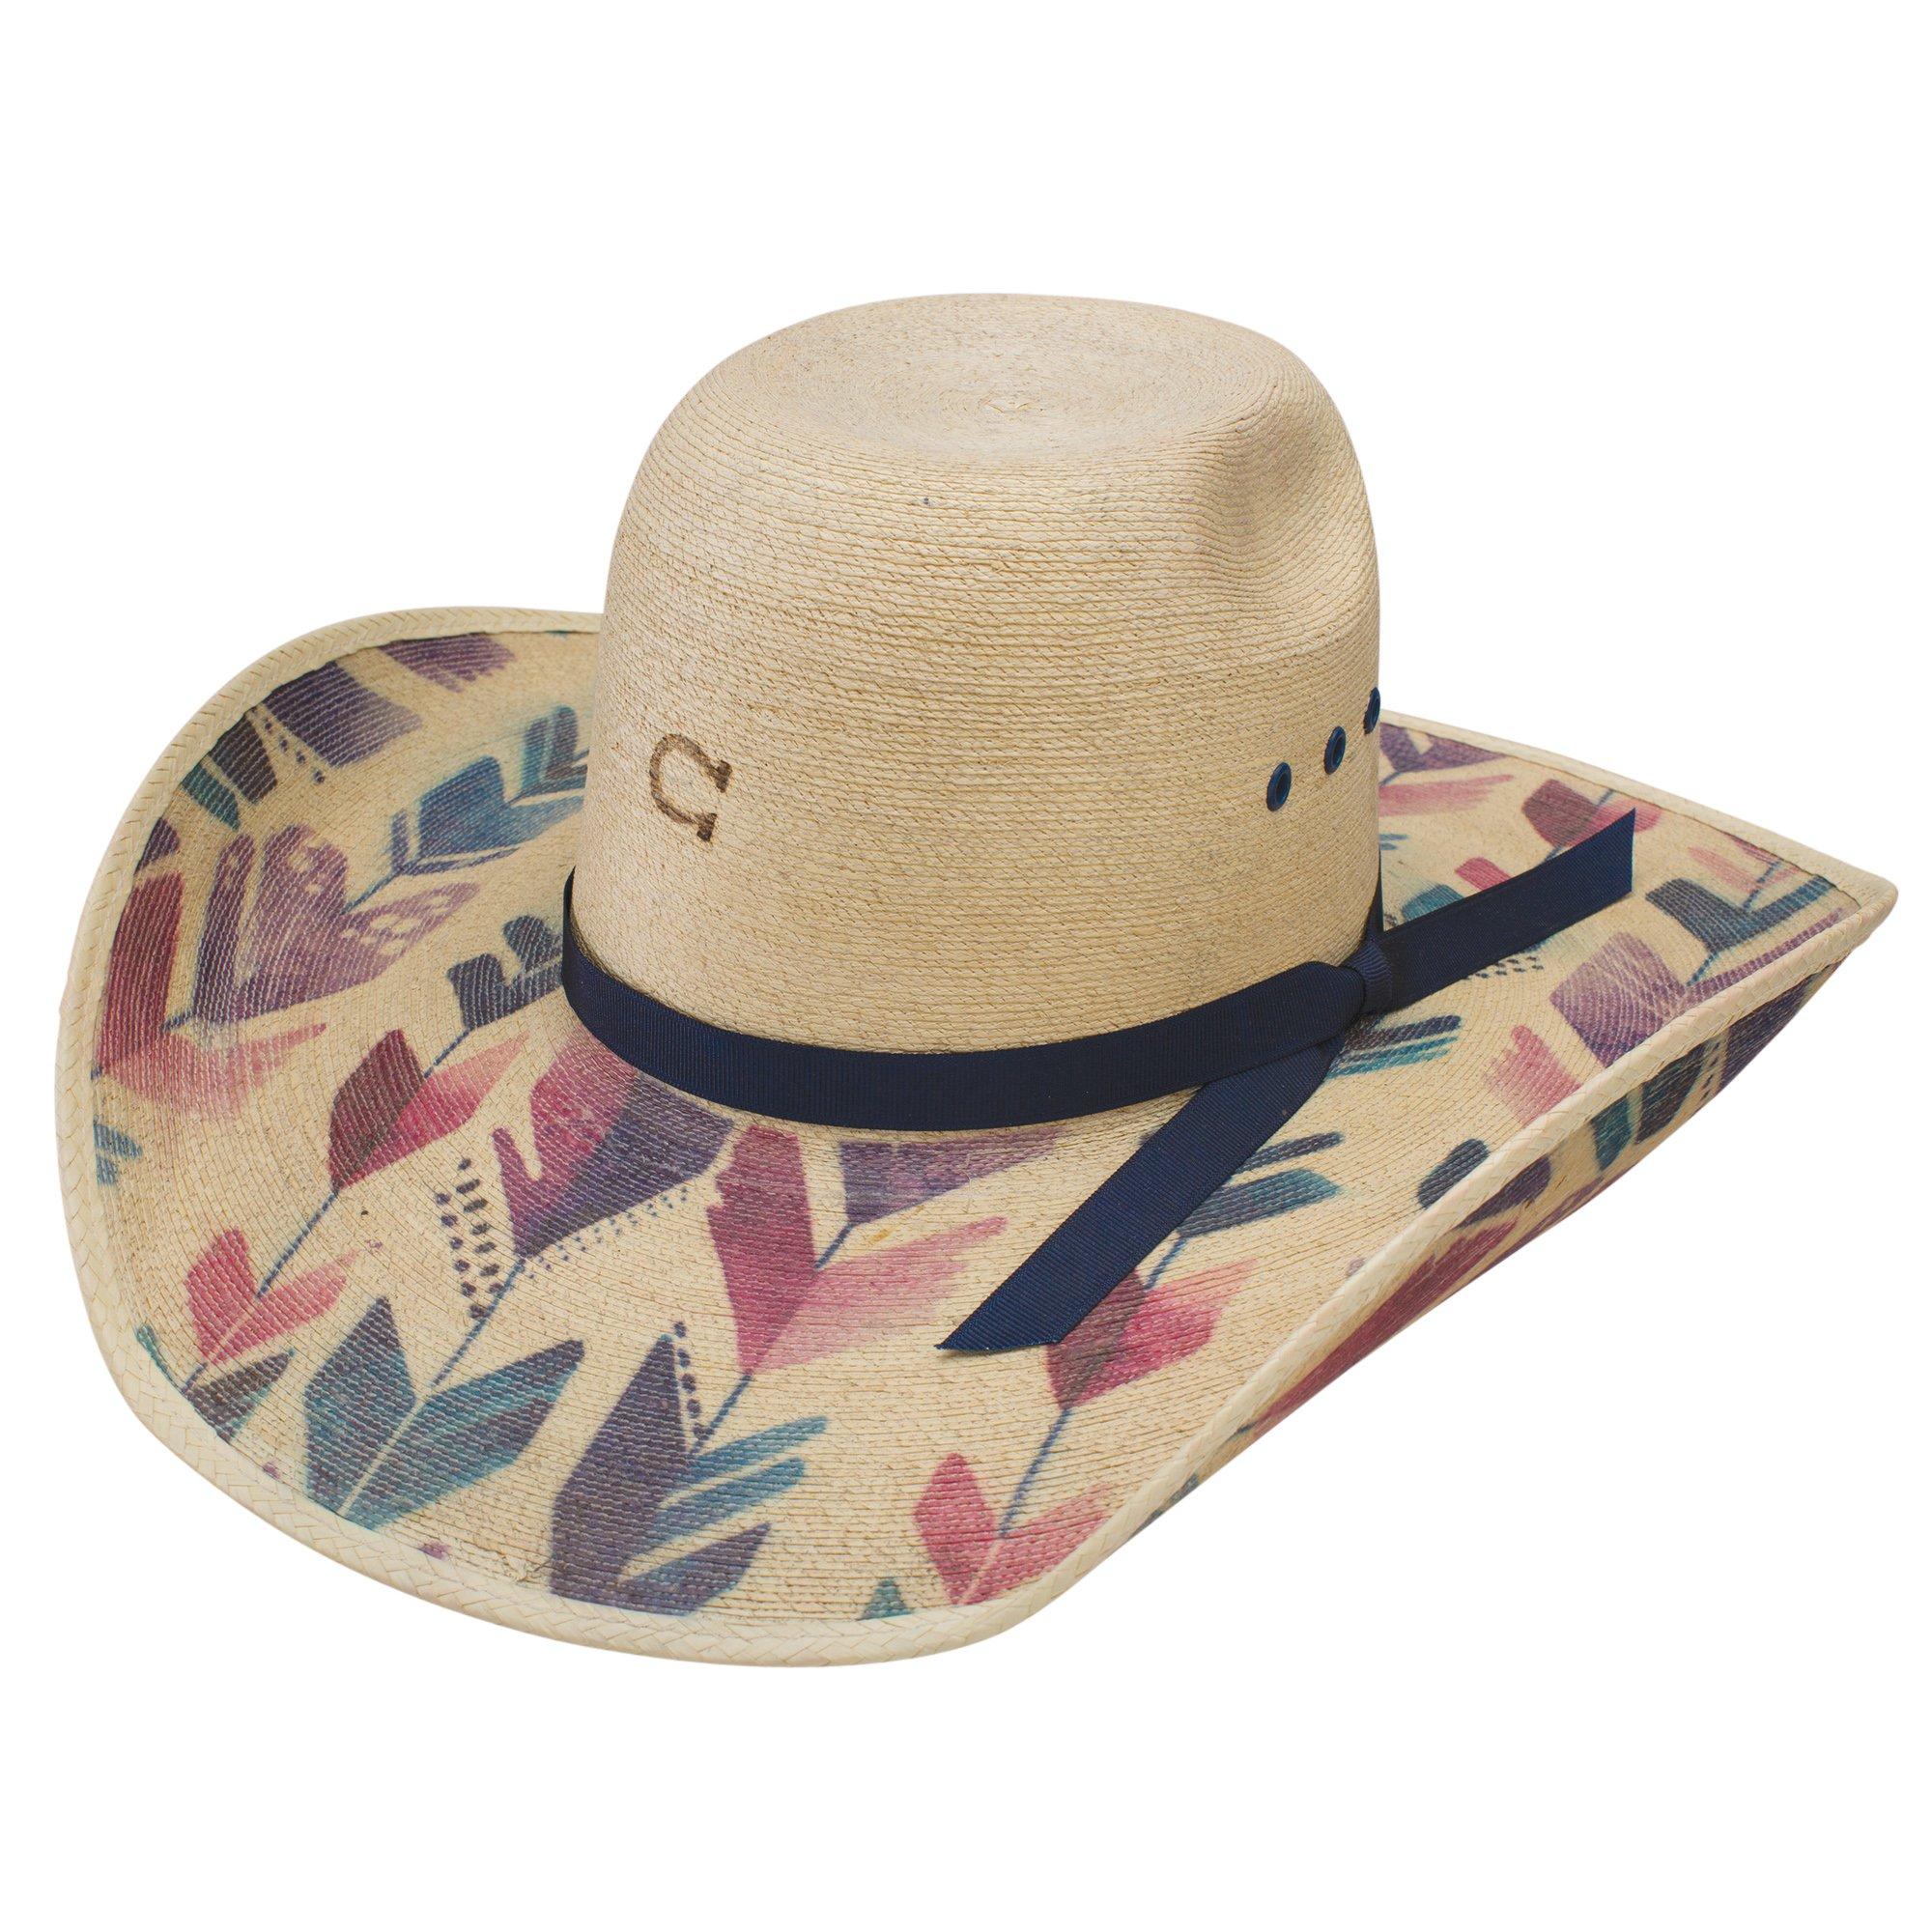 Charlie 1 Horse Hats Womens Straight Arrow 4 1/4 Brim Fashion Hat 73/8